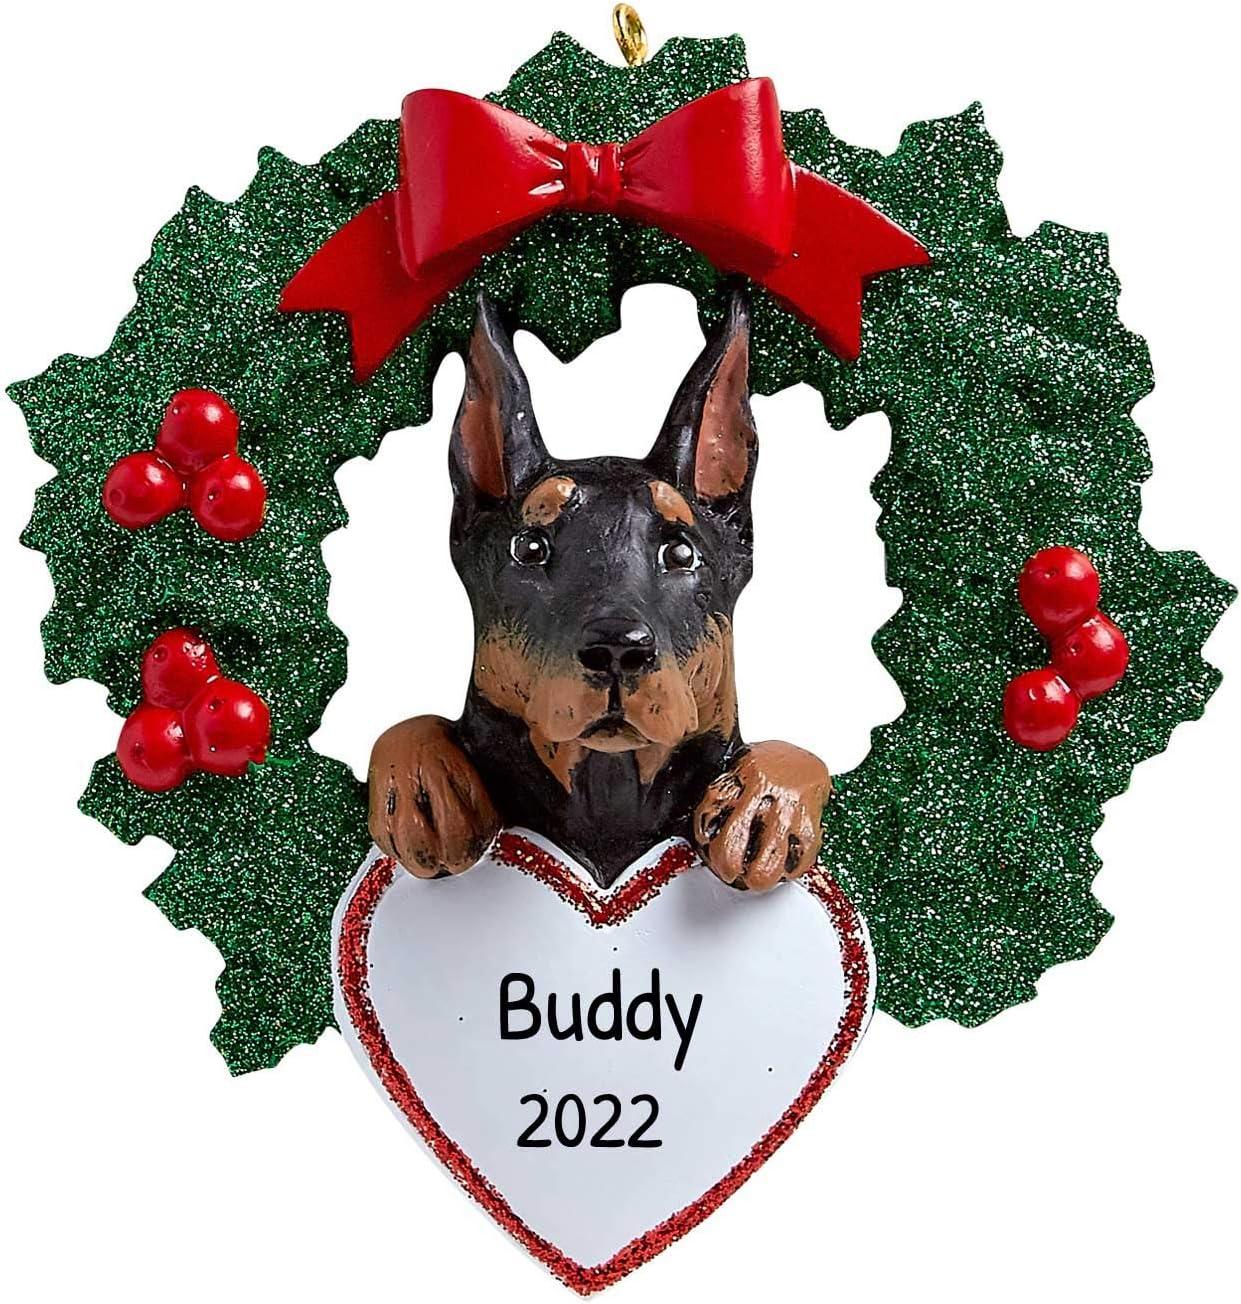 Pet Lover/'s Wreath Dog Lover/'s Wreath Personalized Min Pin Pet Wreath Miniature Pinscher Wreath Personalized Dog Wreath Min Pin Gift